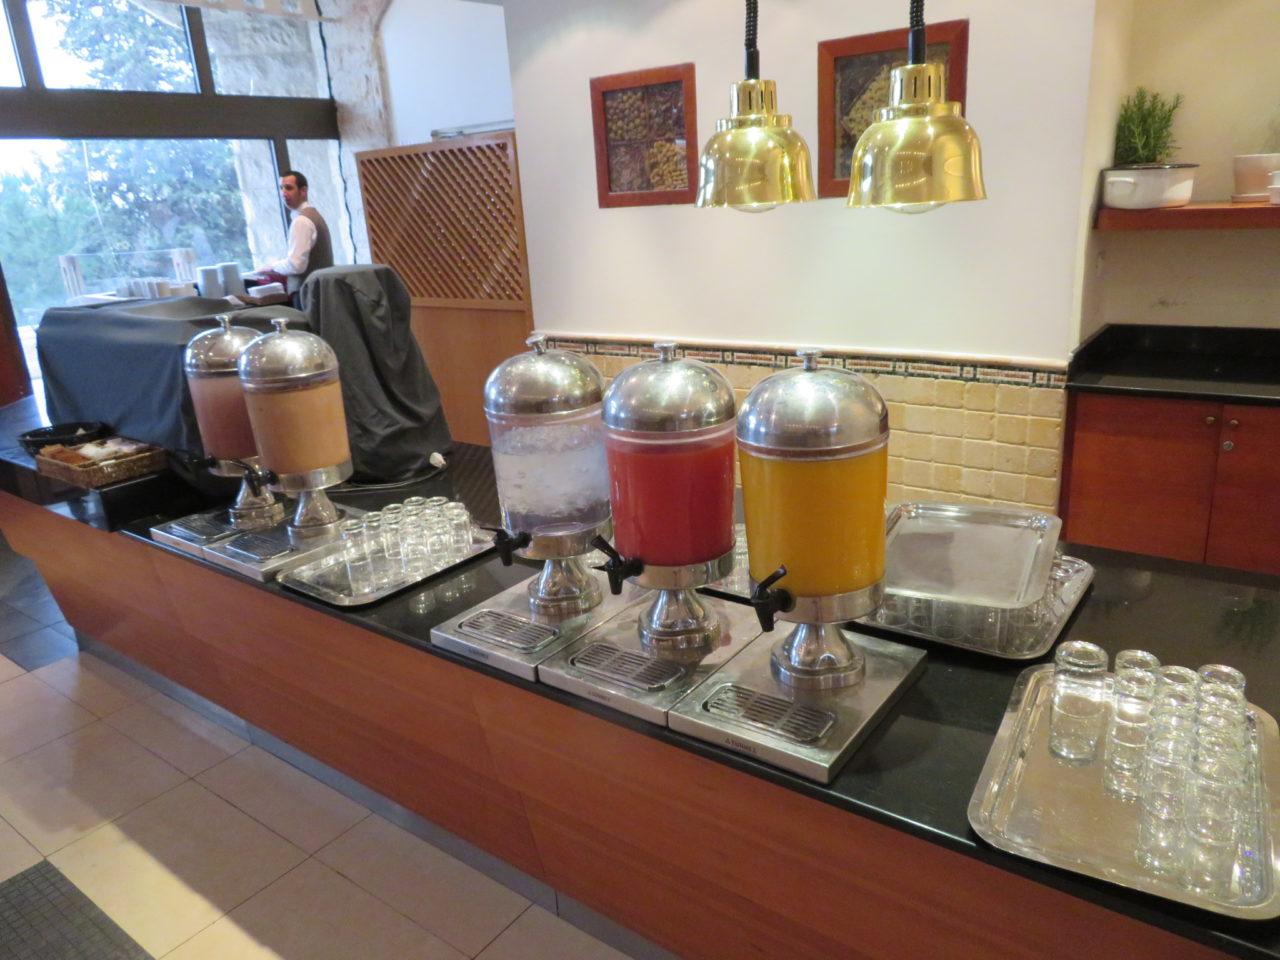 Israeli Breakfast : Freshly Squeezed Juices